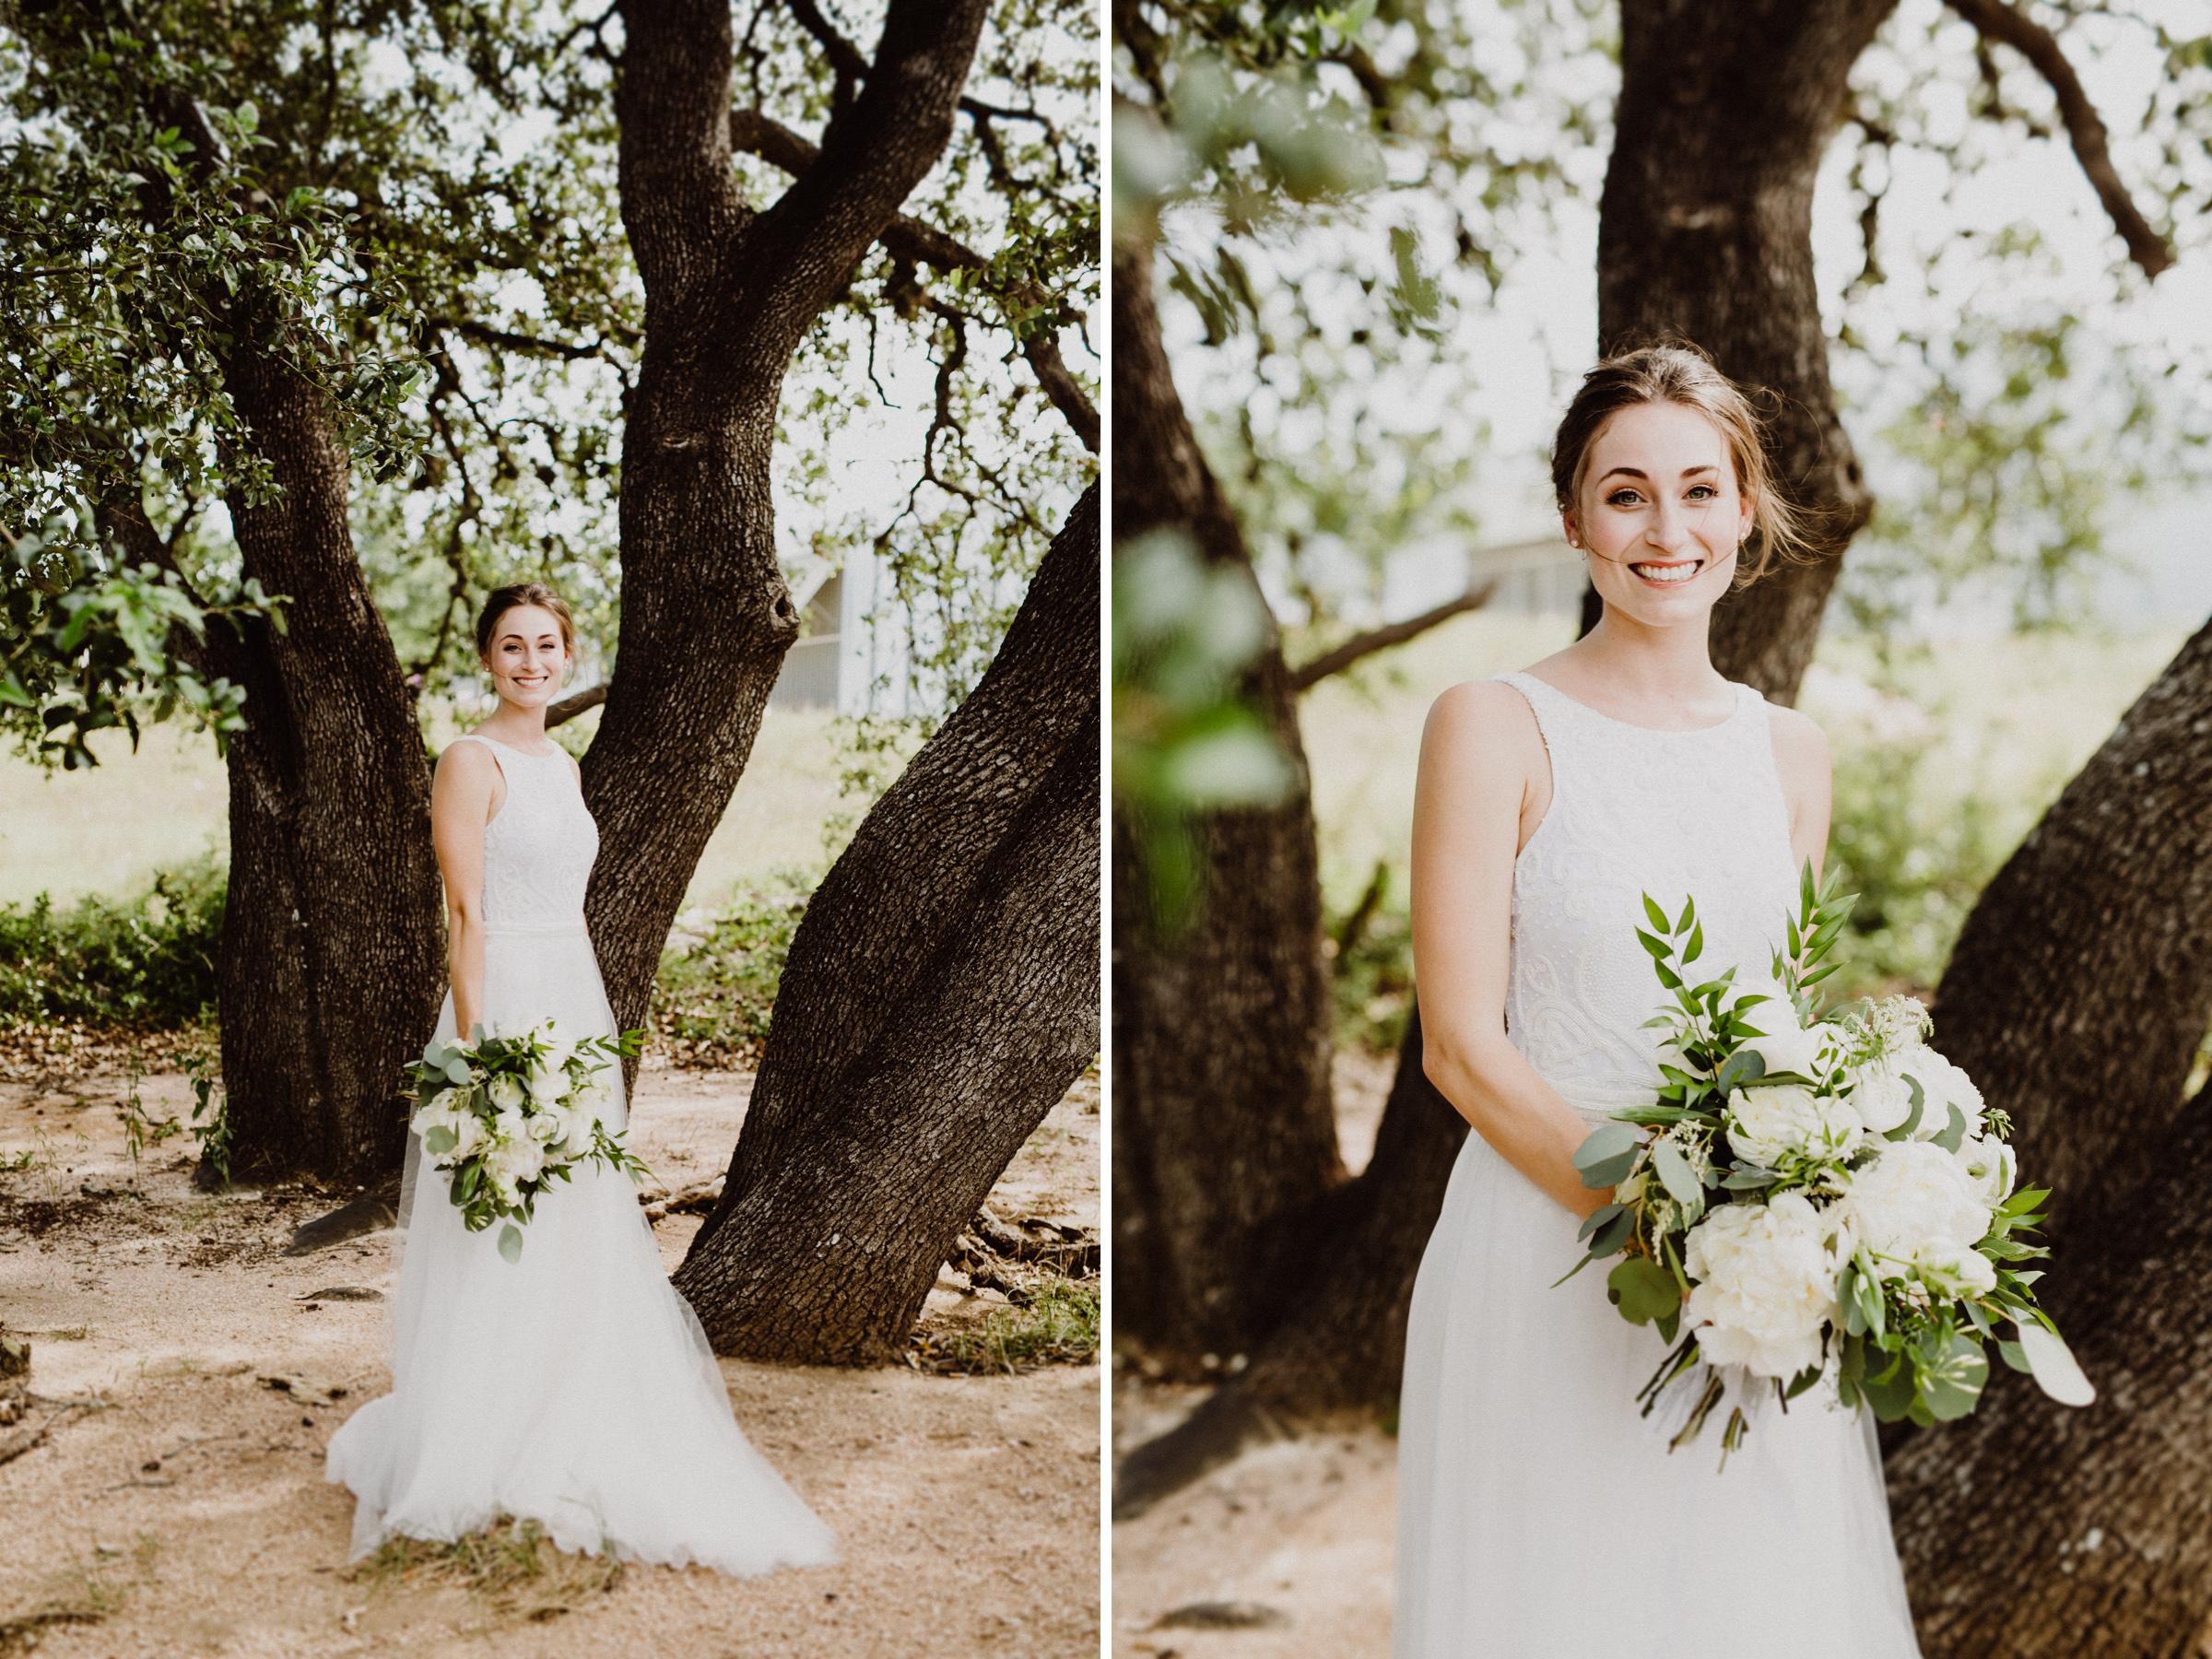 prospect-house-wedding-1.jpg